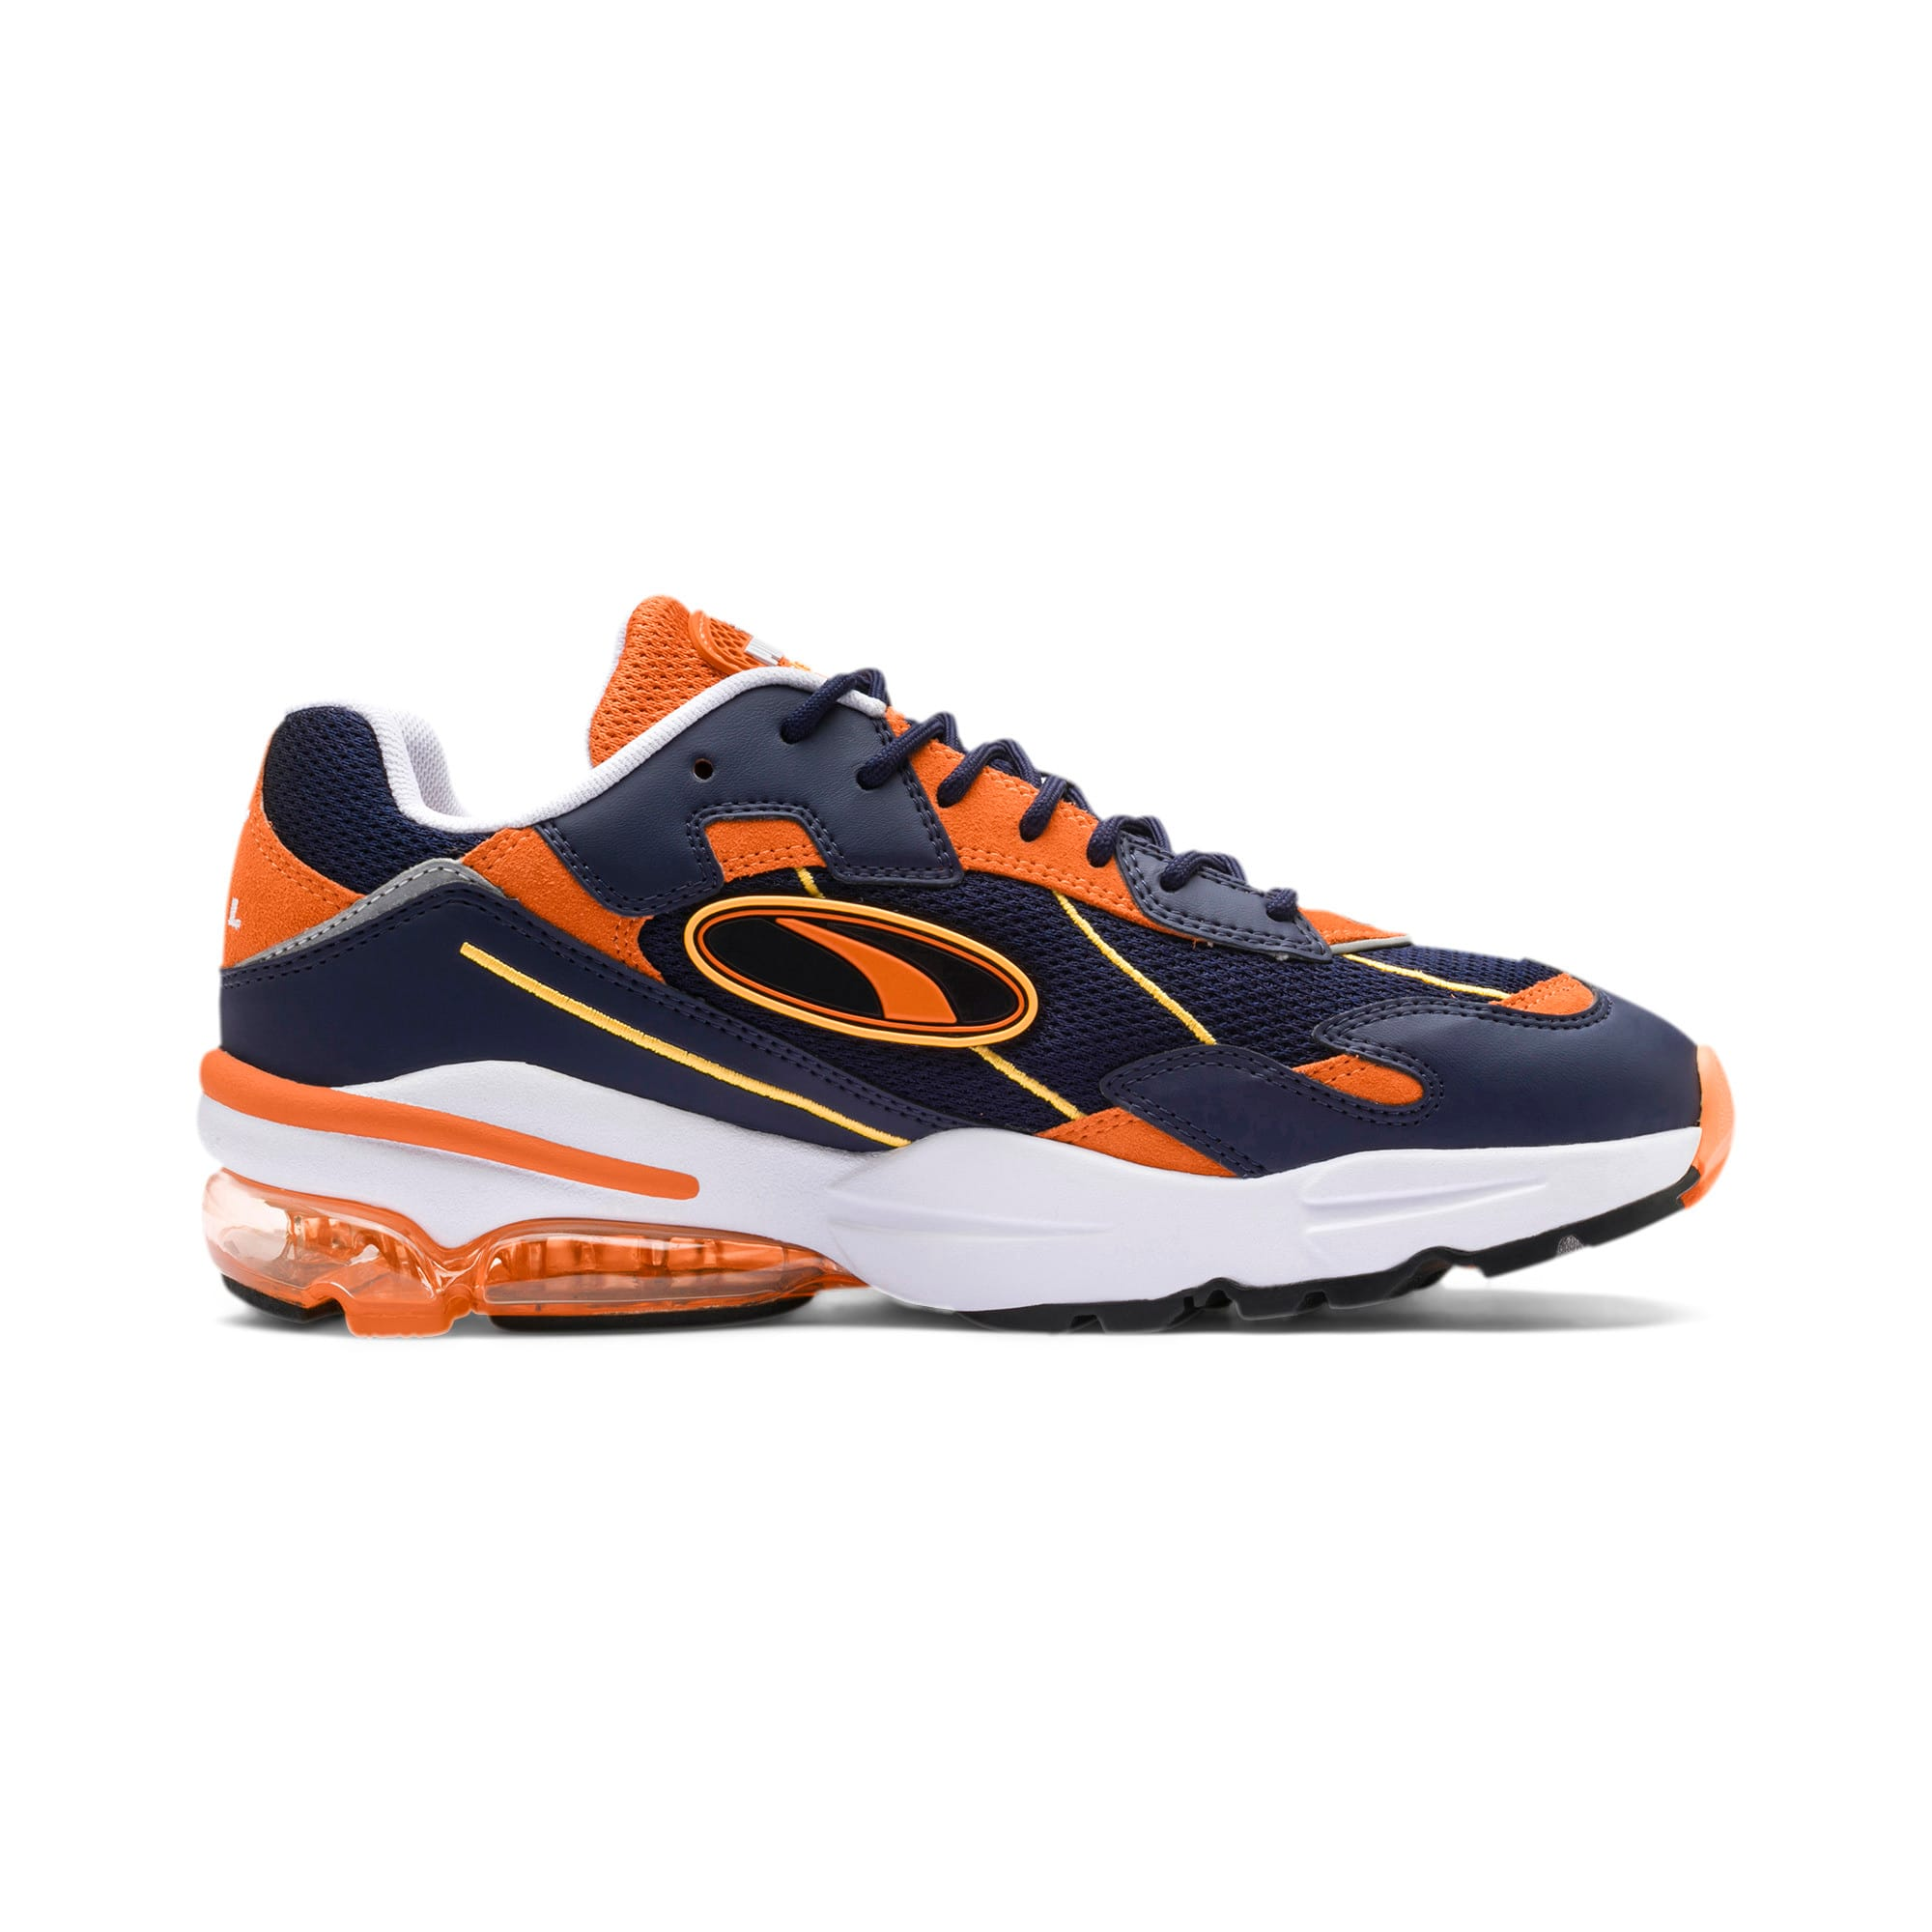 Thumbnail 6 of CELL Ultra OG Pack Sneakers, Peacoat-Jaffa Orange, medium